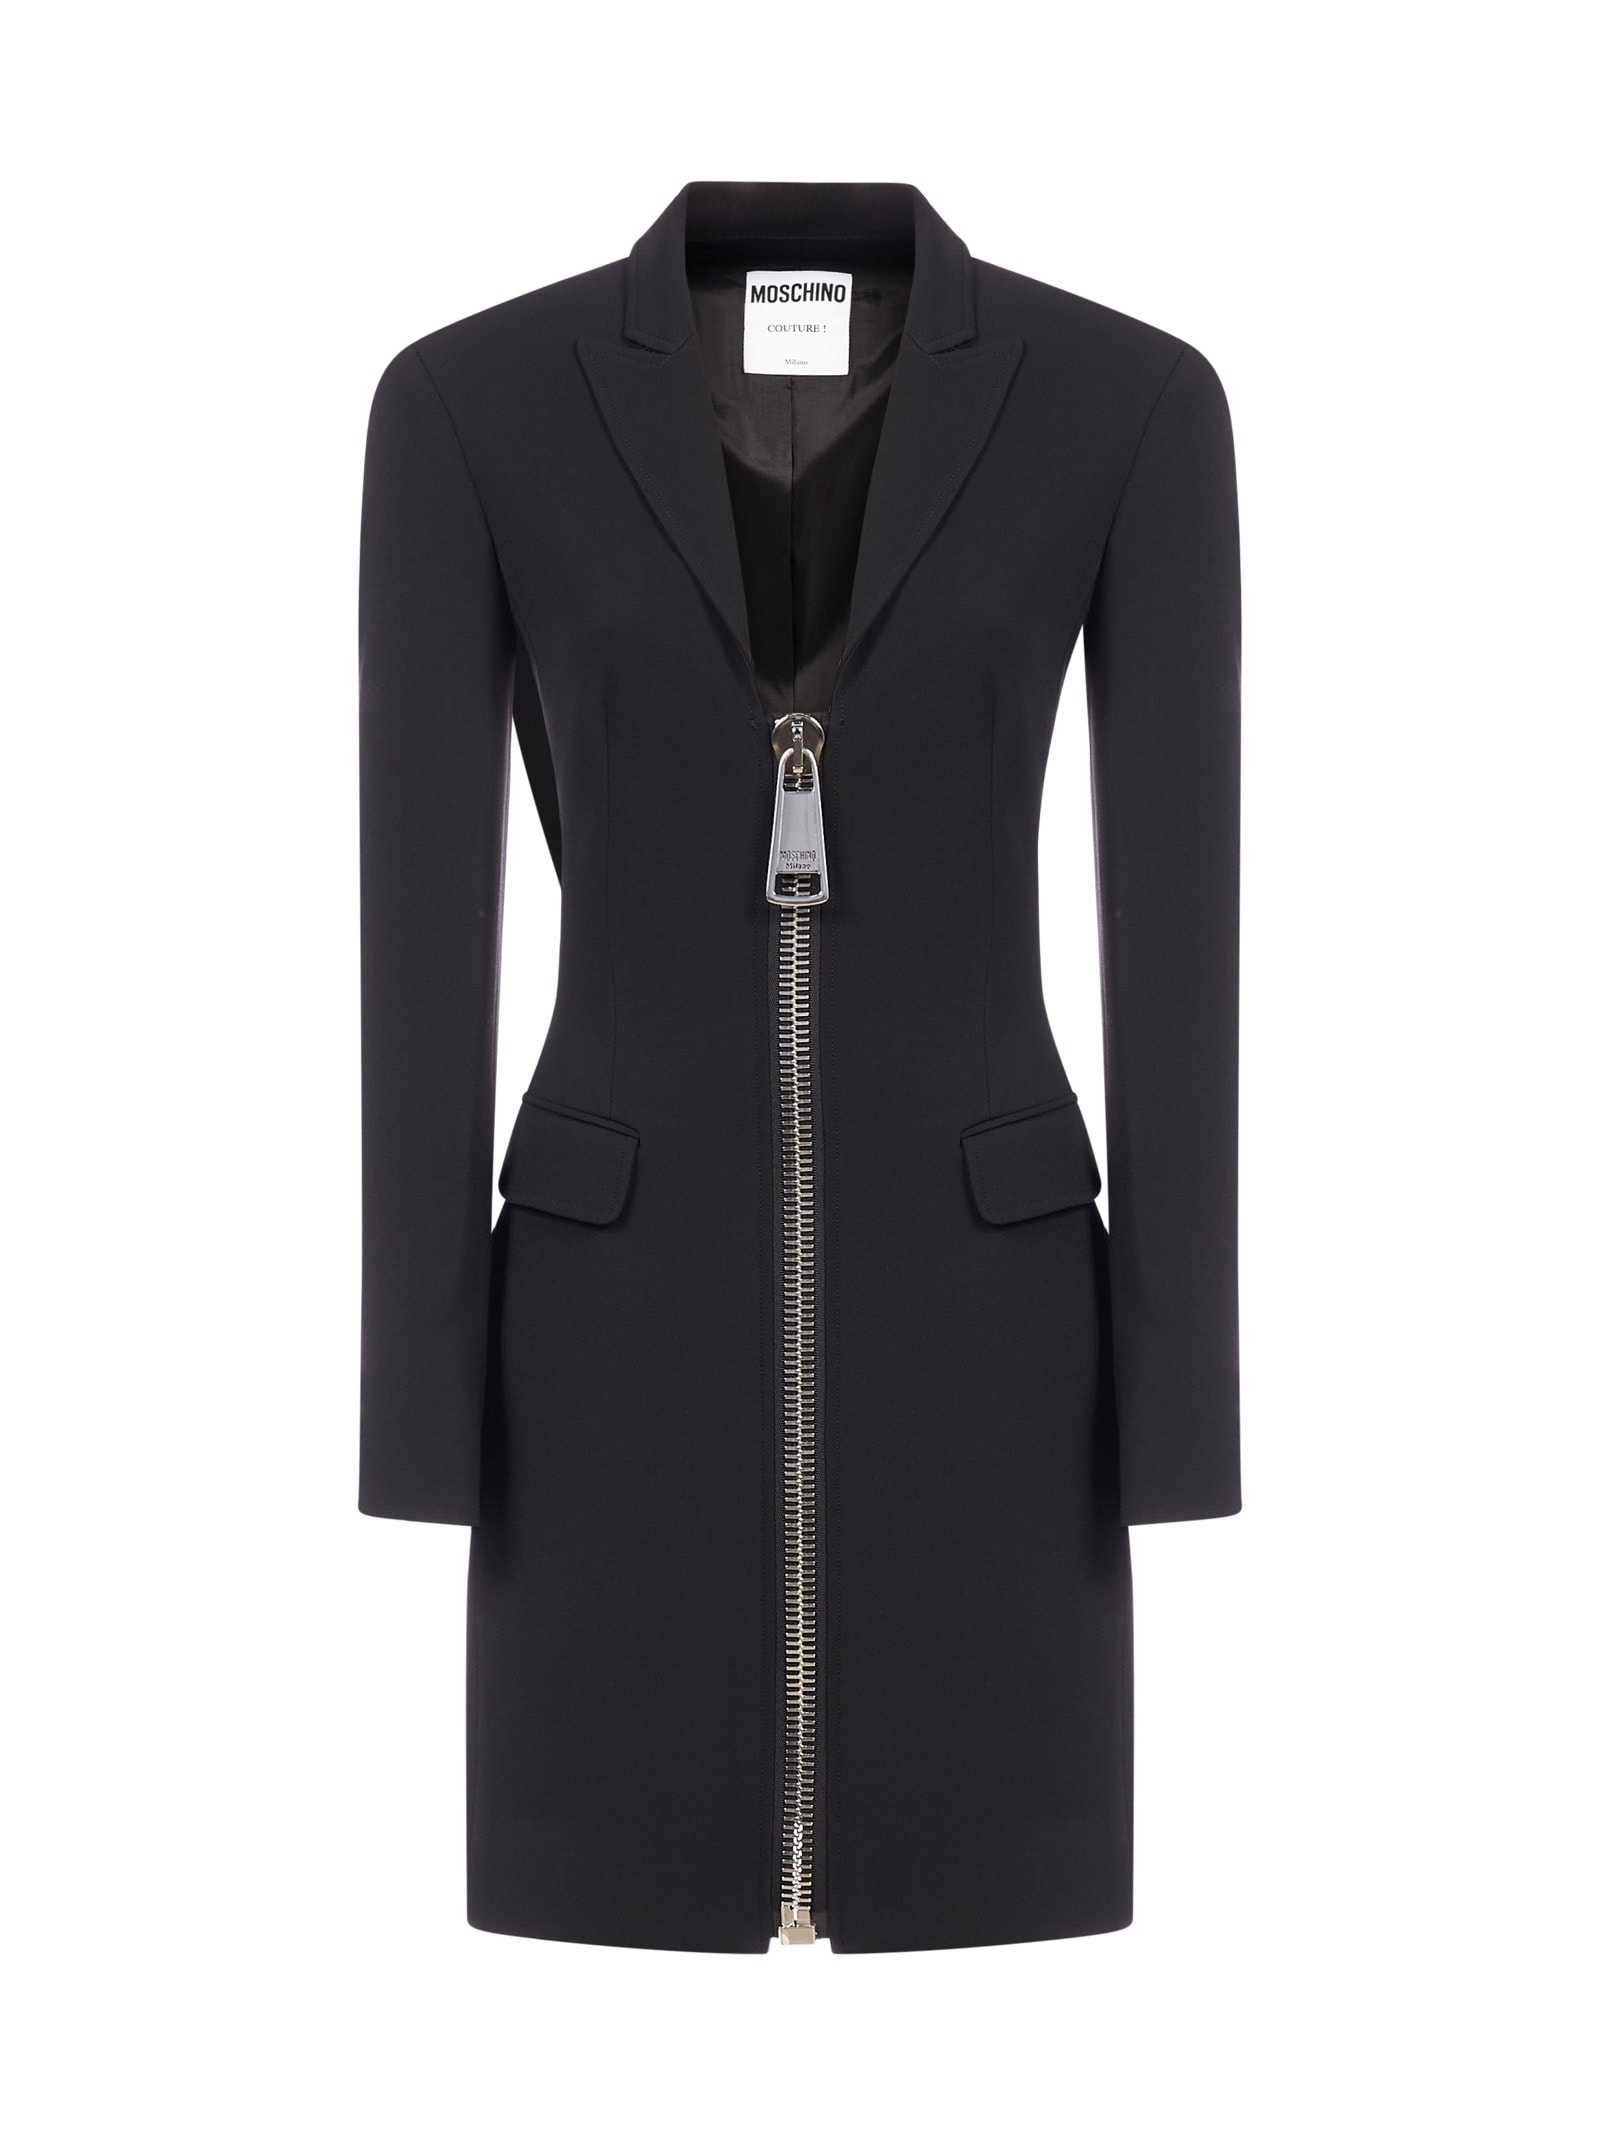 Moschino Zip Viscose Blazer- Dress